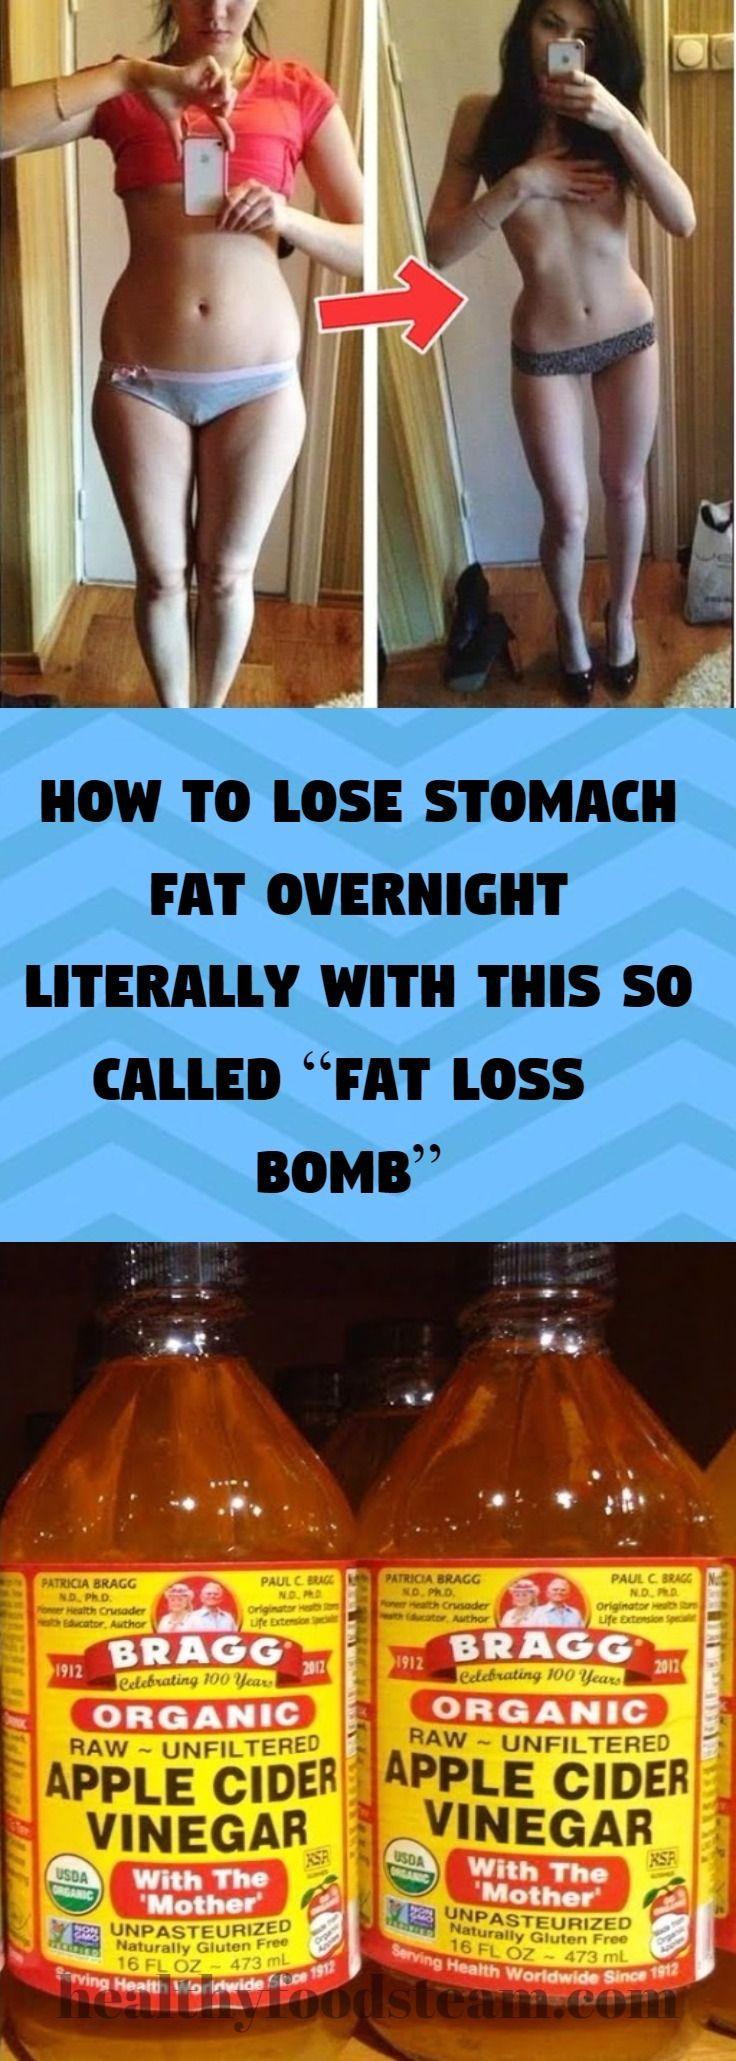 Do body wraps help lose fat